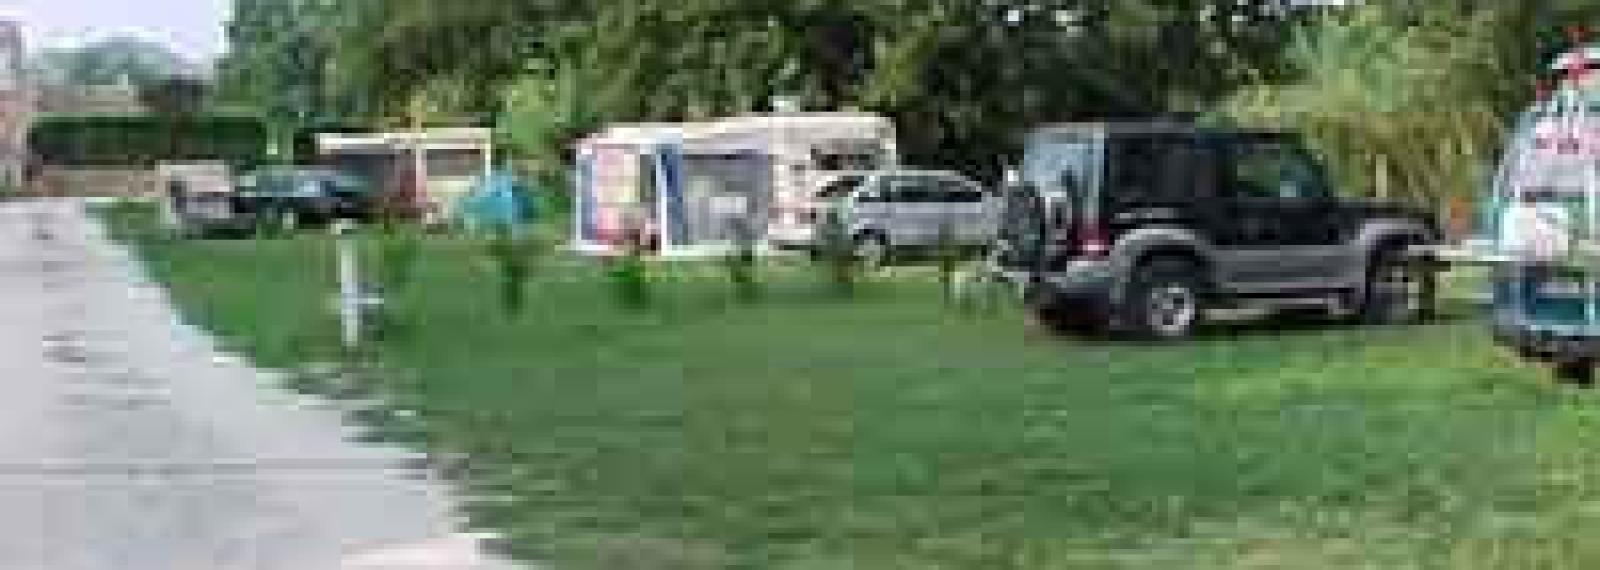 Camping du Vieux Chemin d' Arles